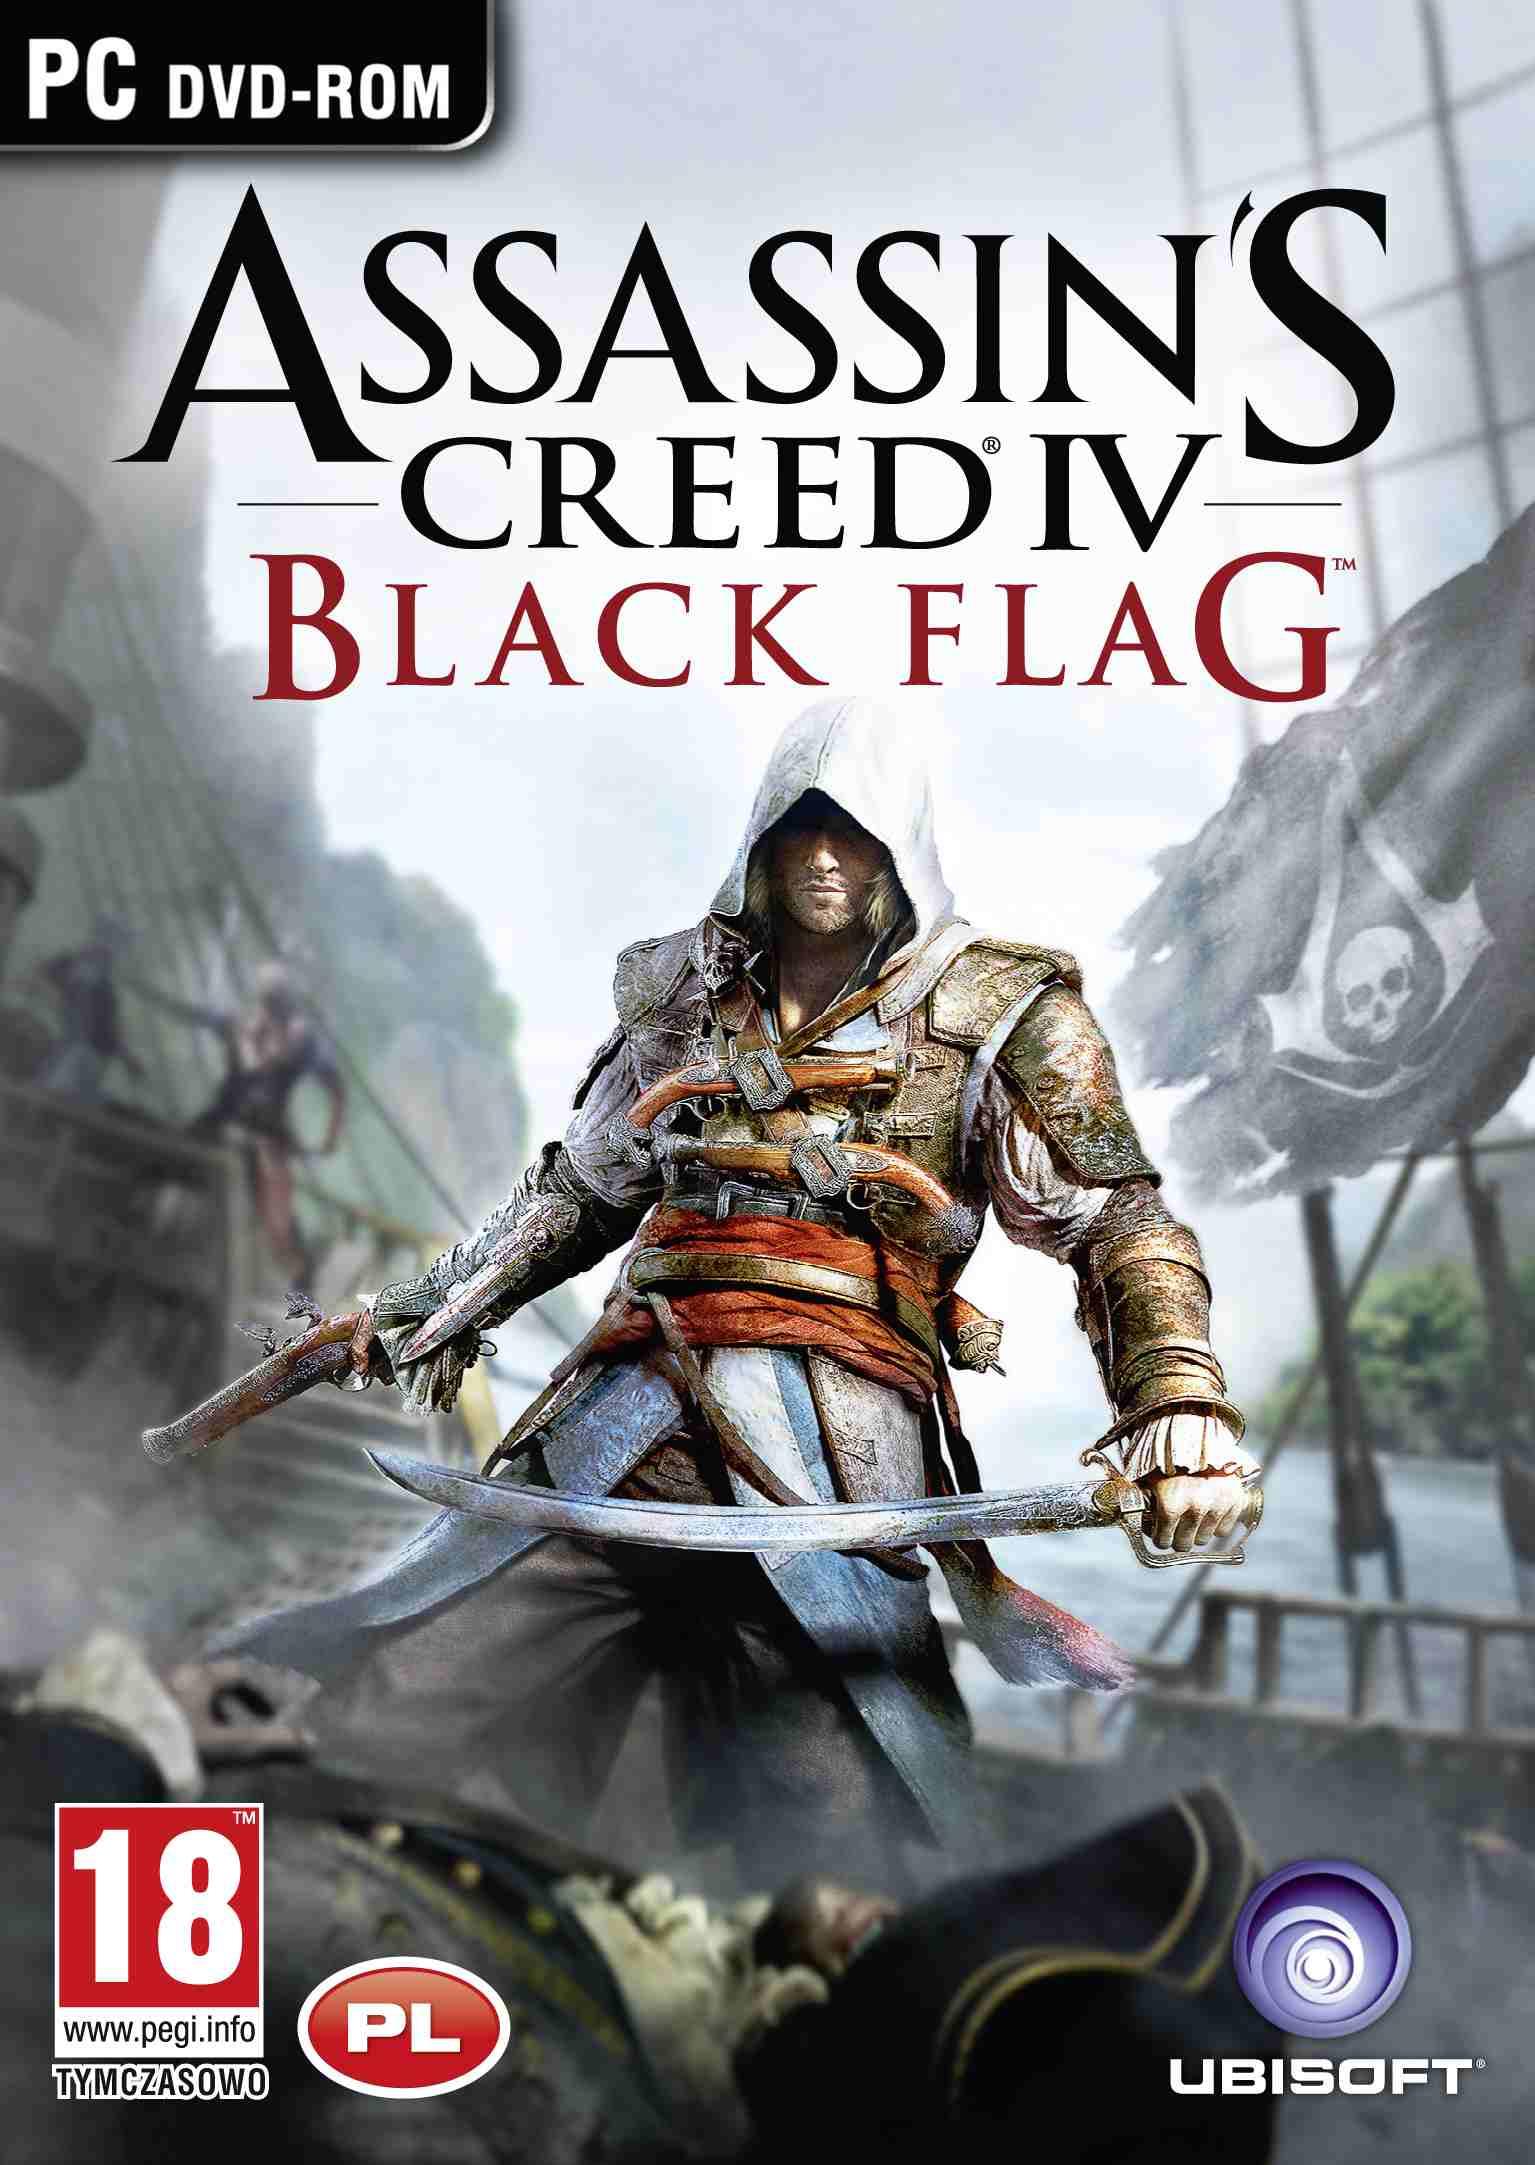 Assassin's Creed IV Black Flag Buccaneer Edition (PC) PL